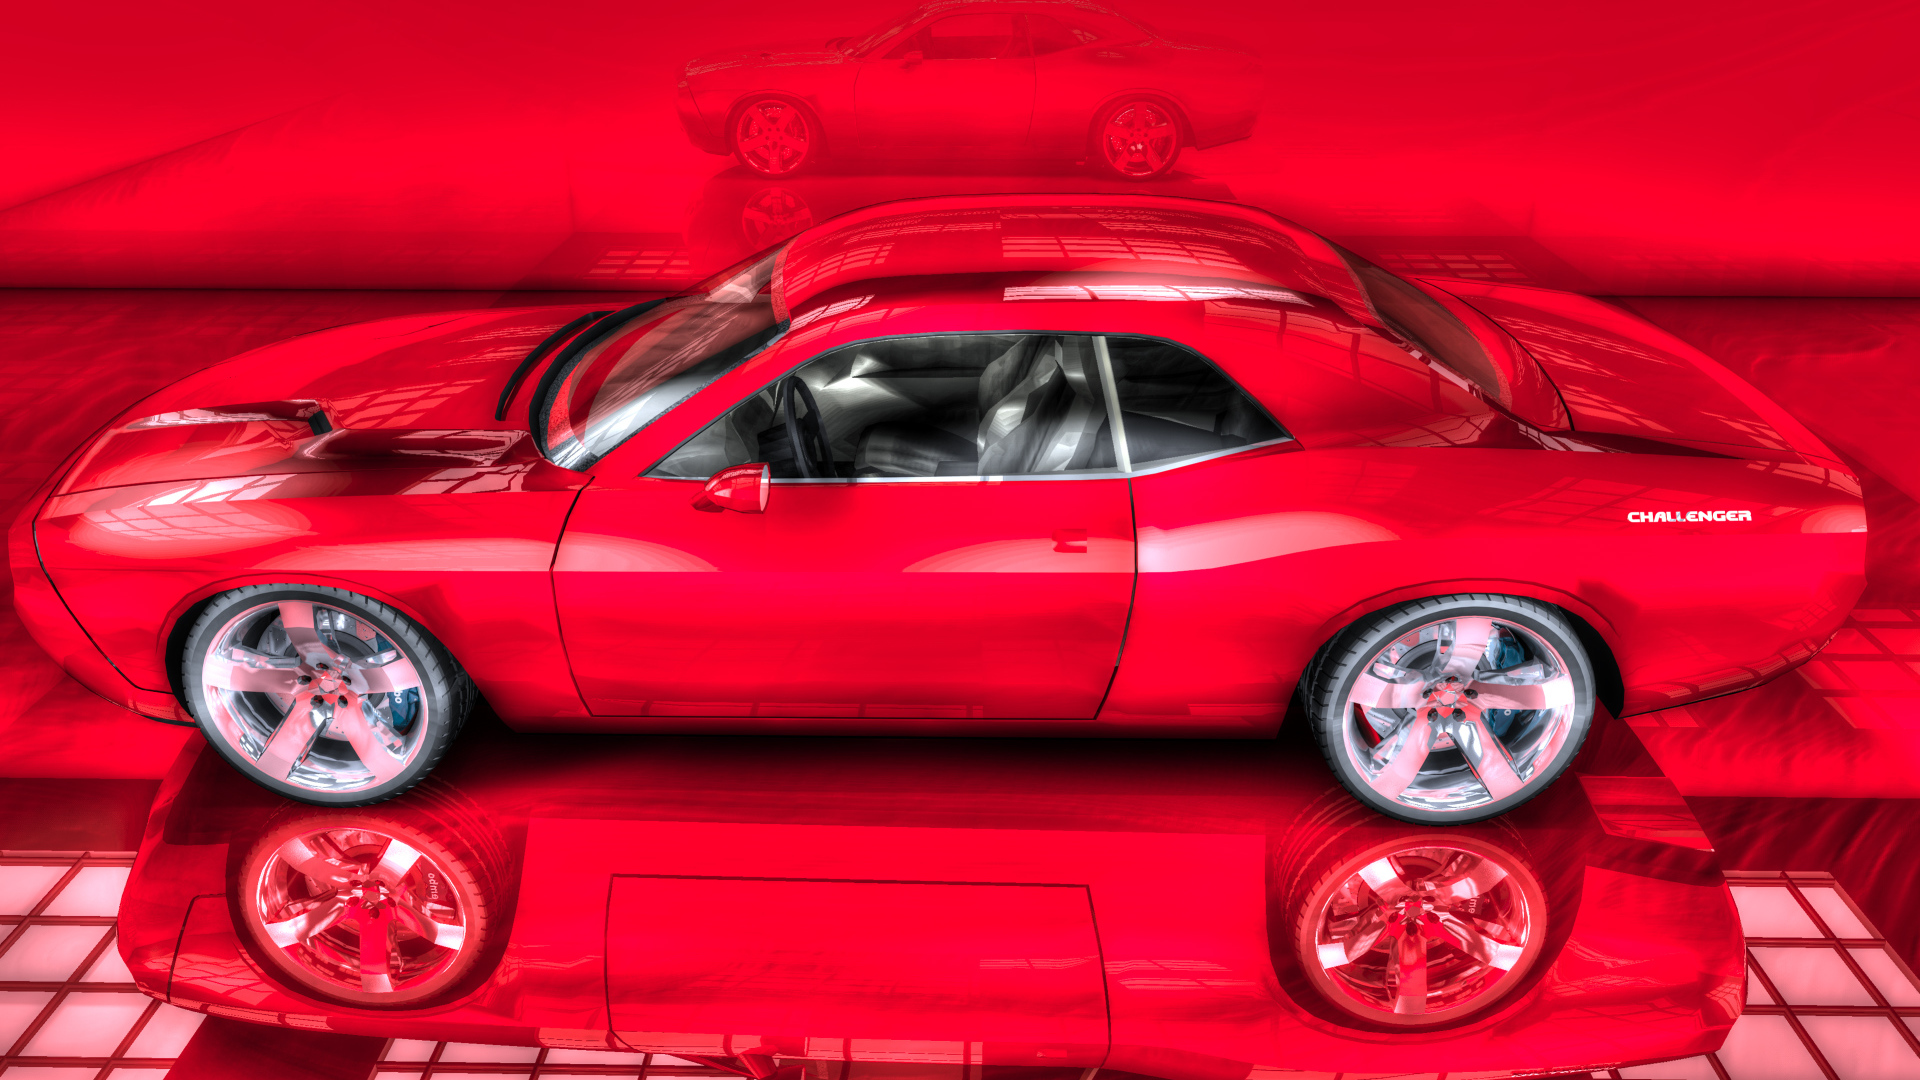 Desktop Wallpaper Hd 3d Full Screen Free Download Posted By Ethan Walker